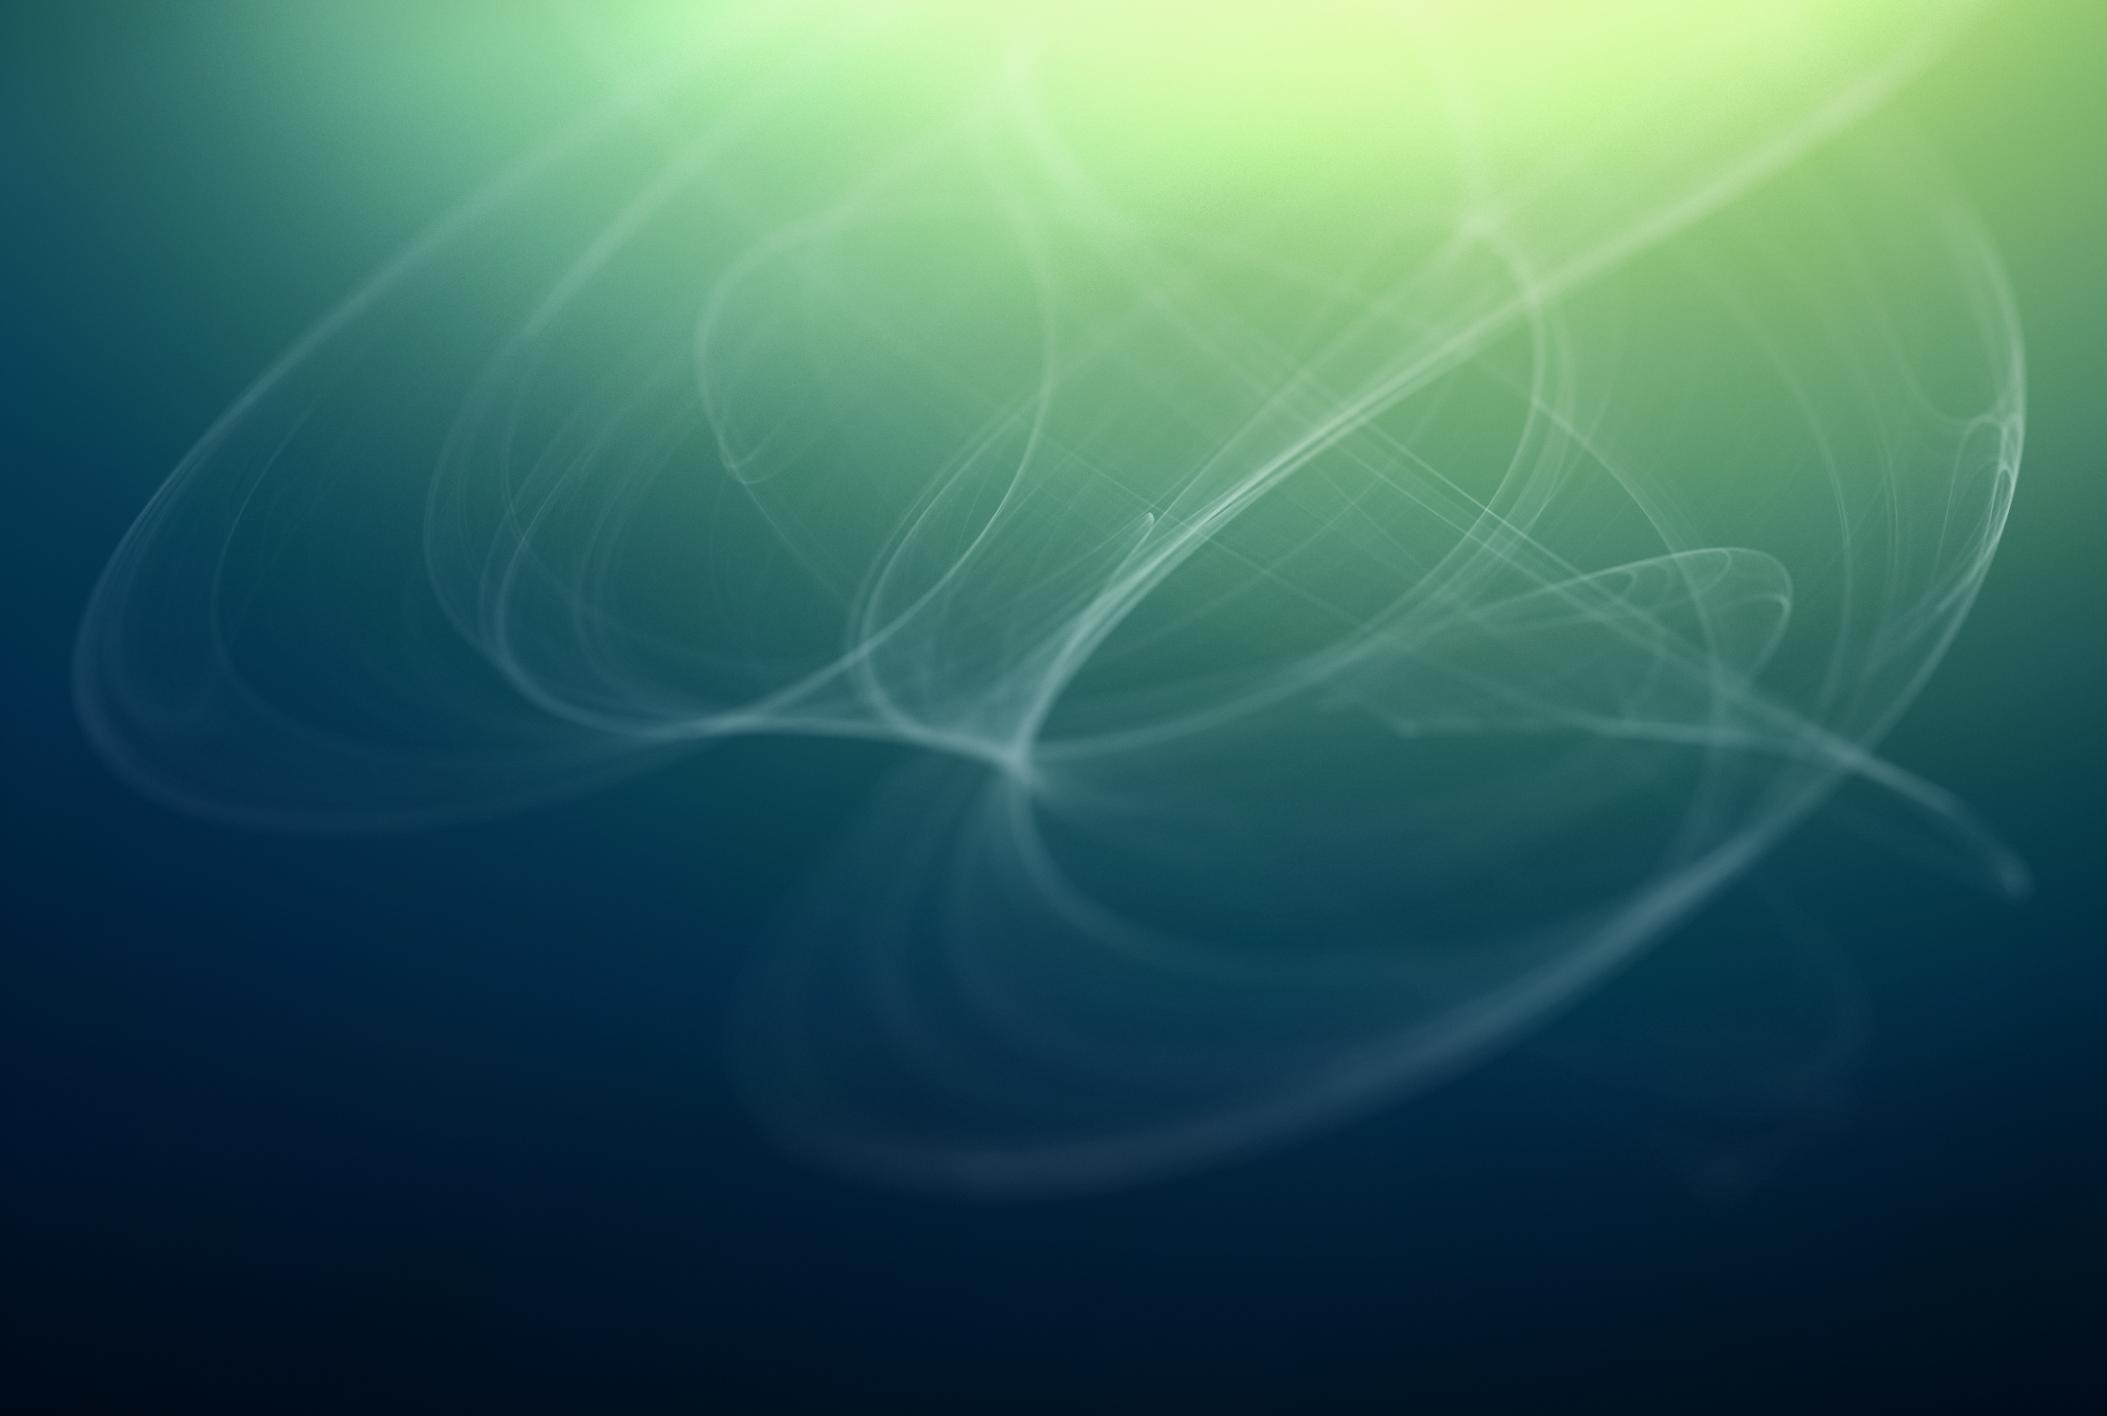 10.0/trisquel-wallpapers/data/usr/share/backgrounds/belenos.png